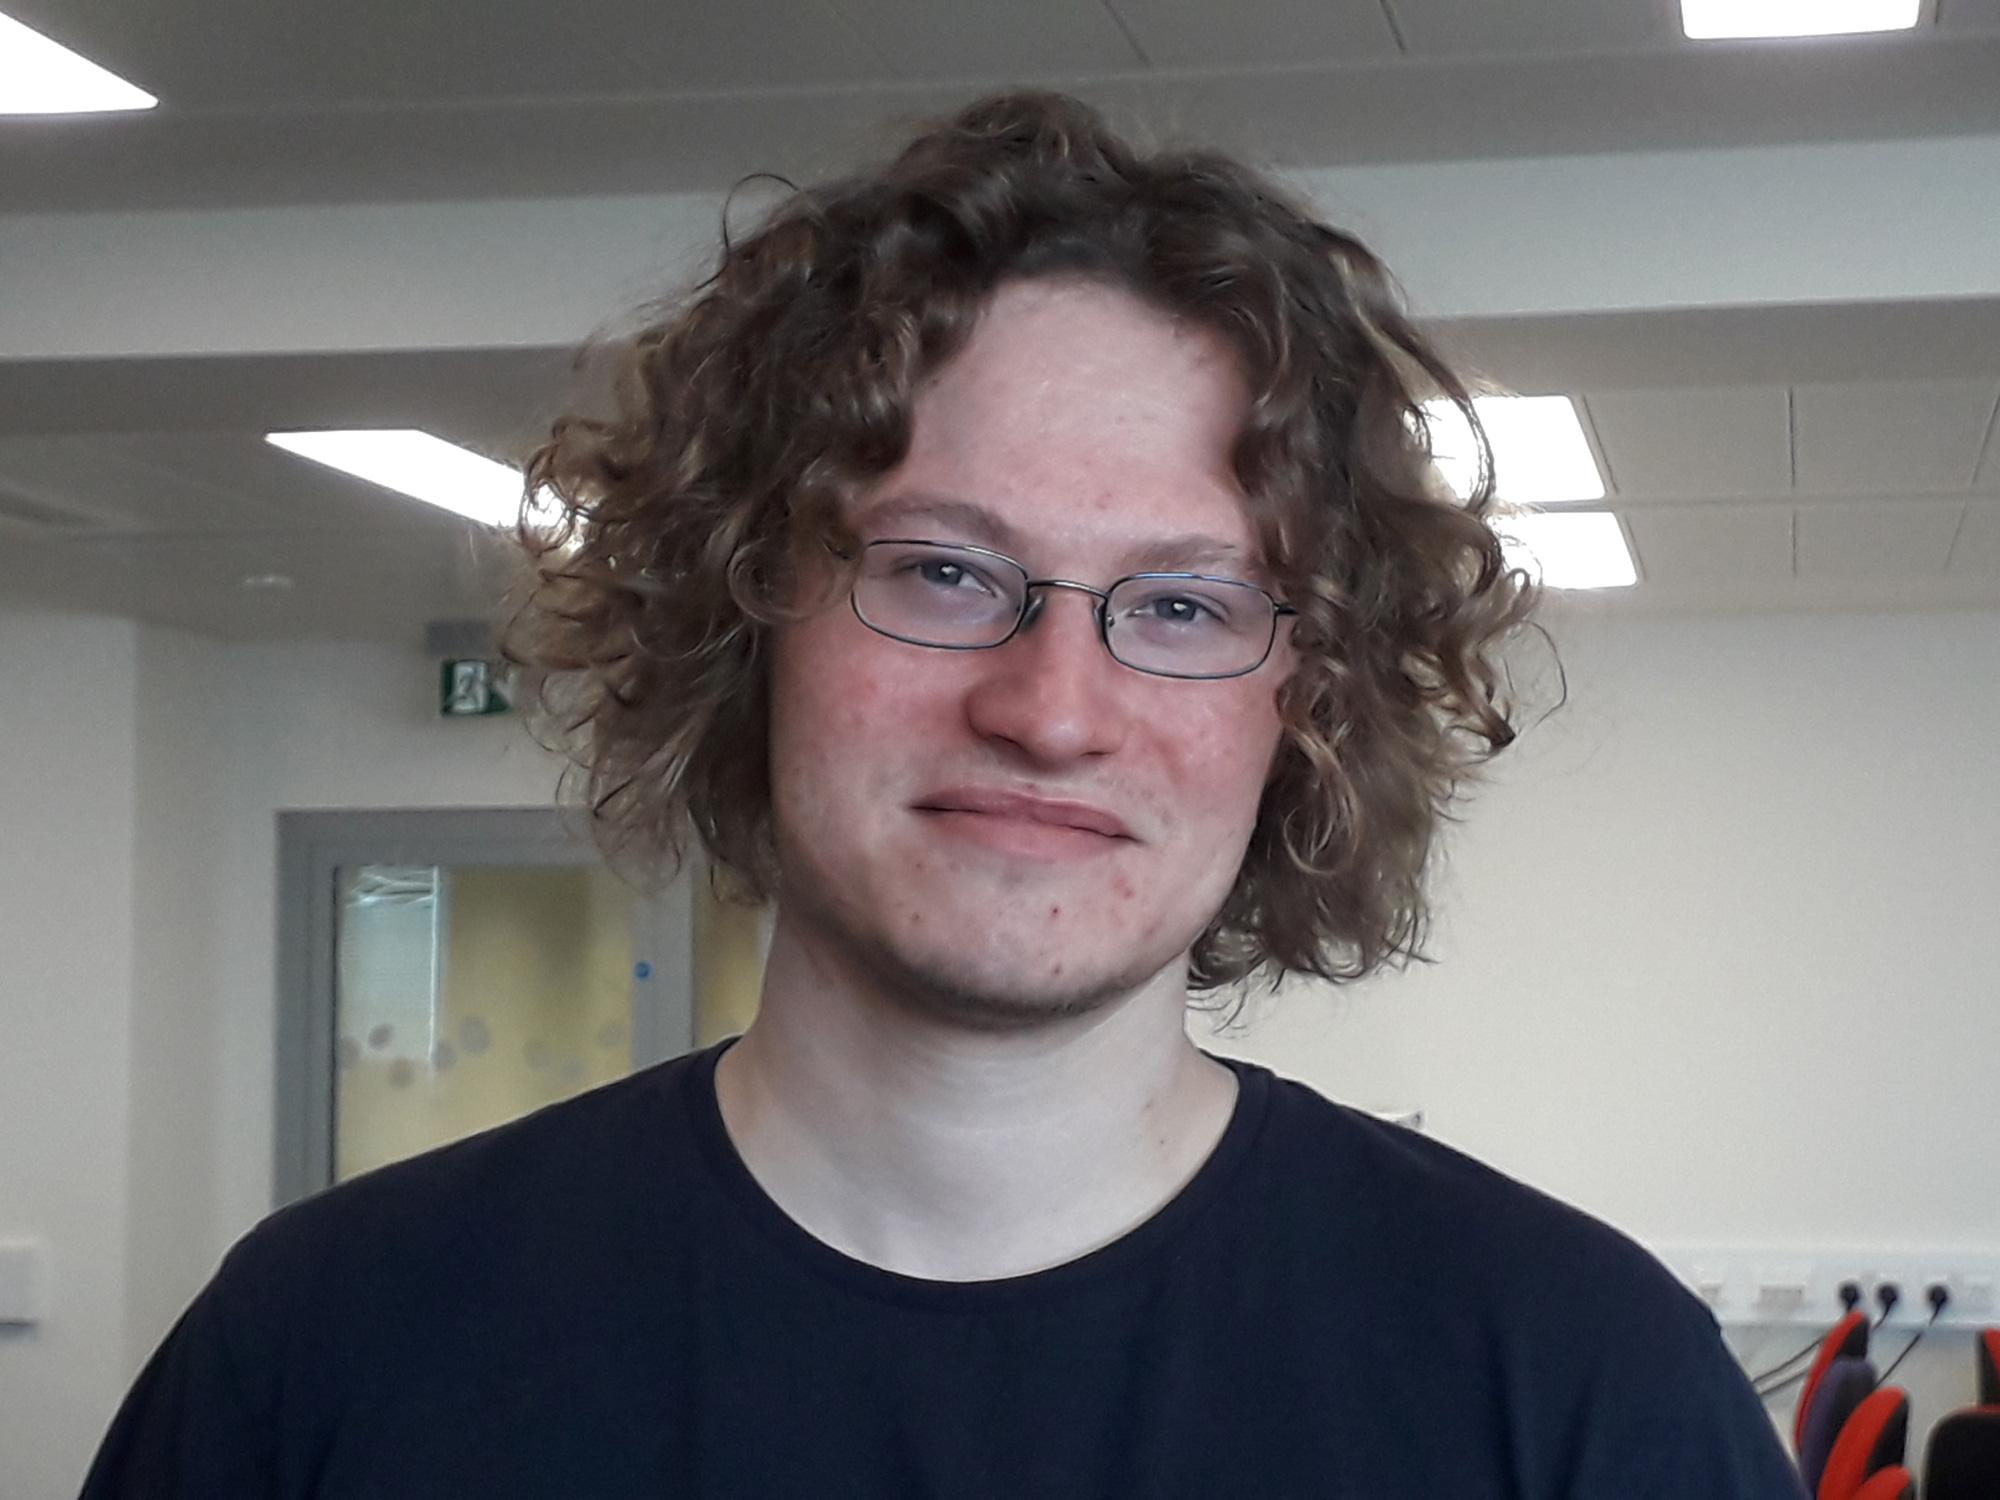 David-Willnow-Profile-Image.jpg